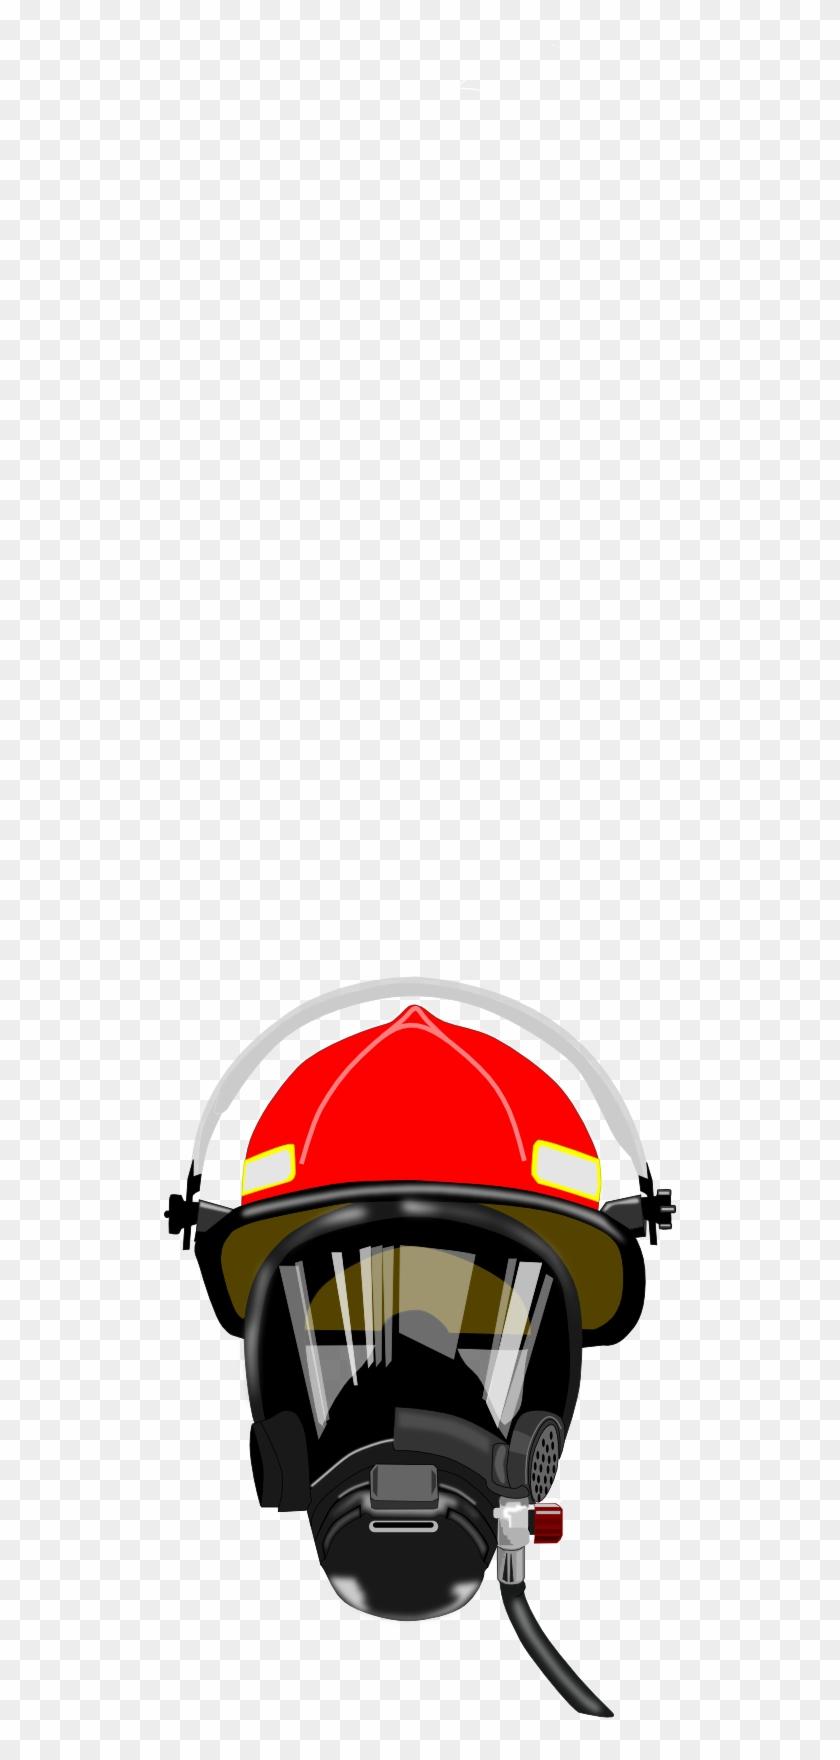 Fire Helmet Mask Clipart - Firefighter Mask Clipart #1633651